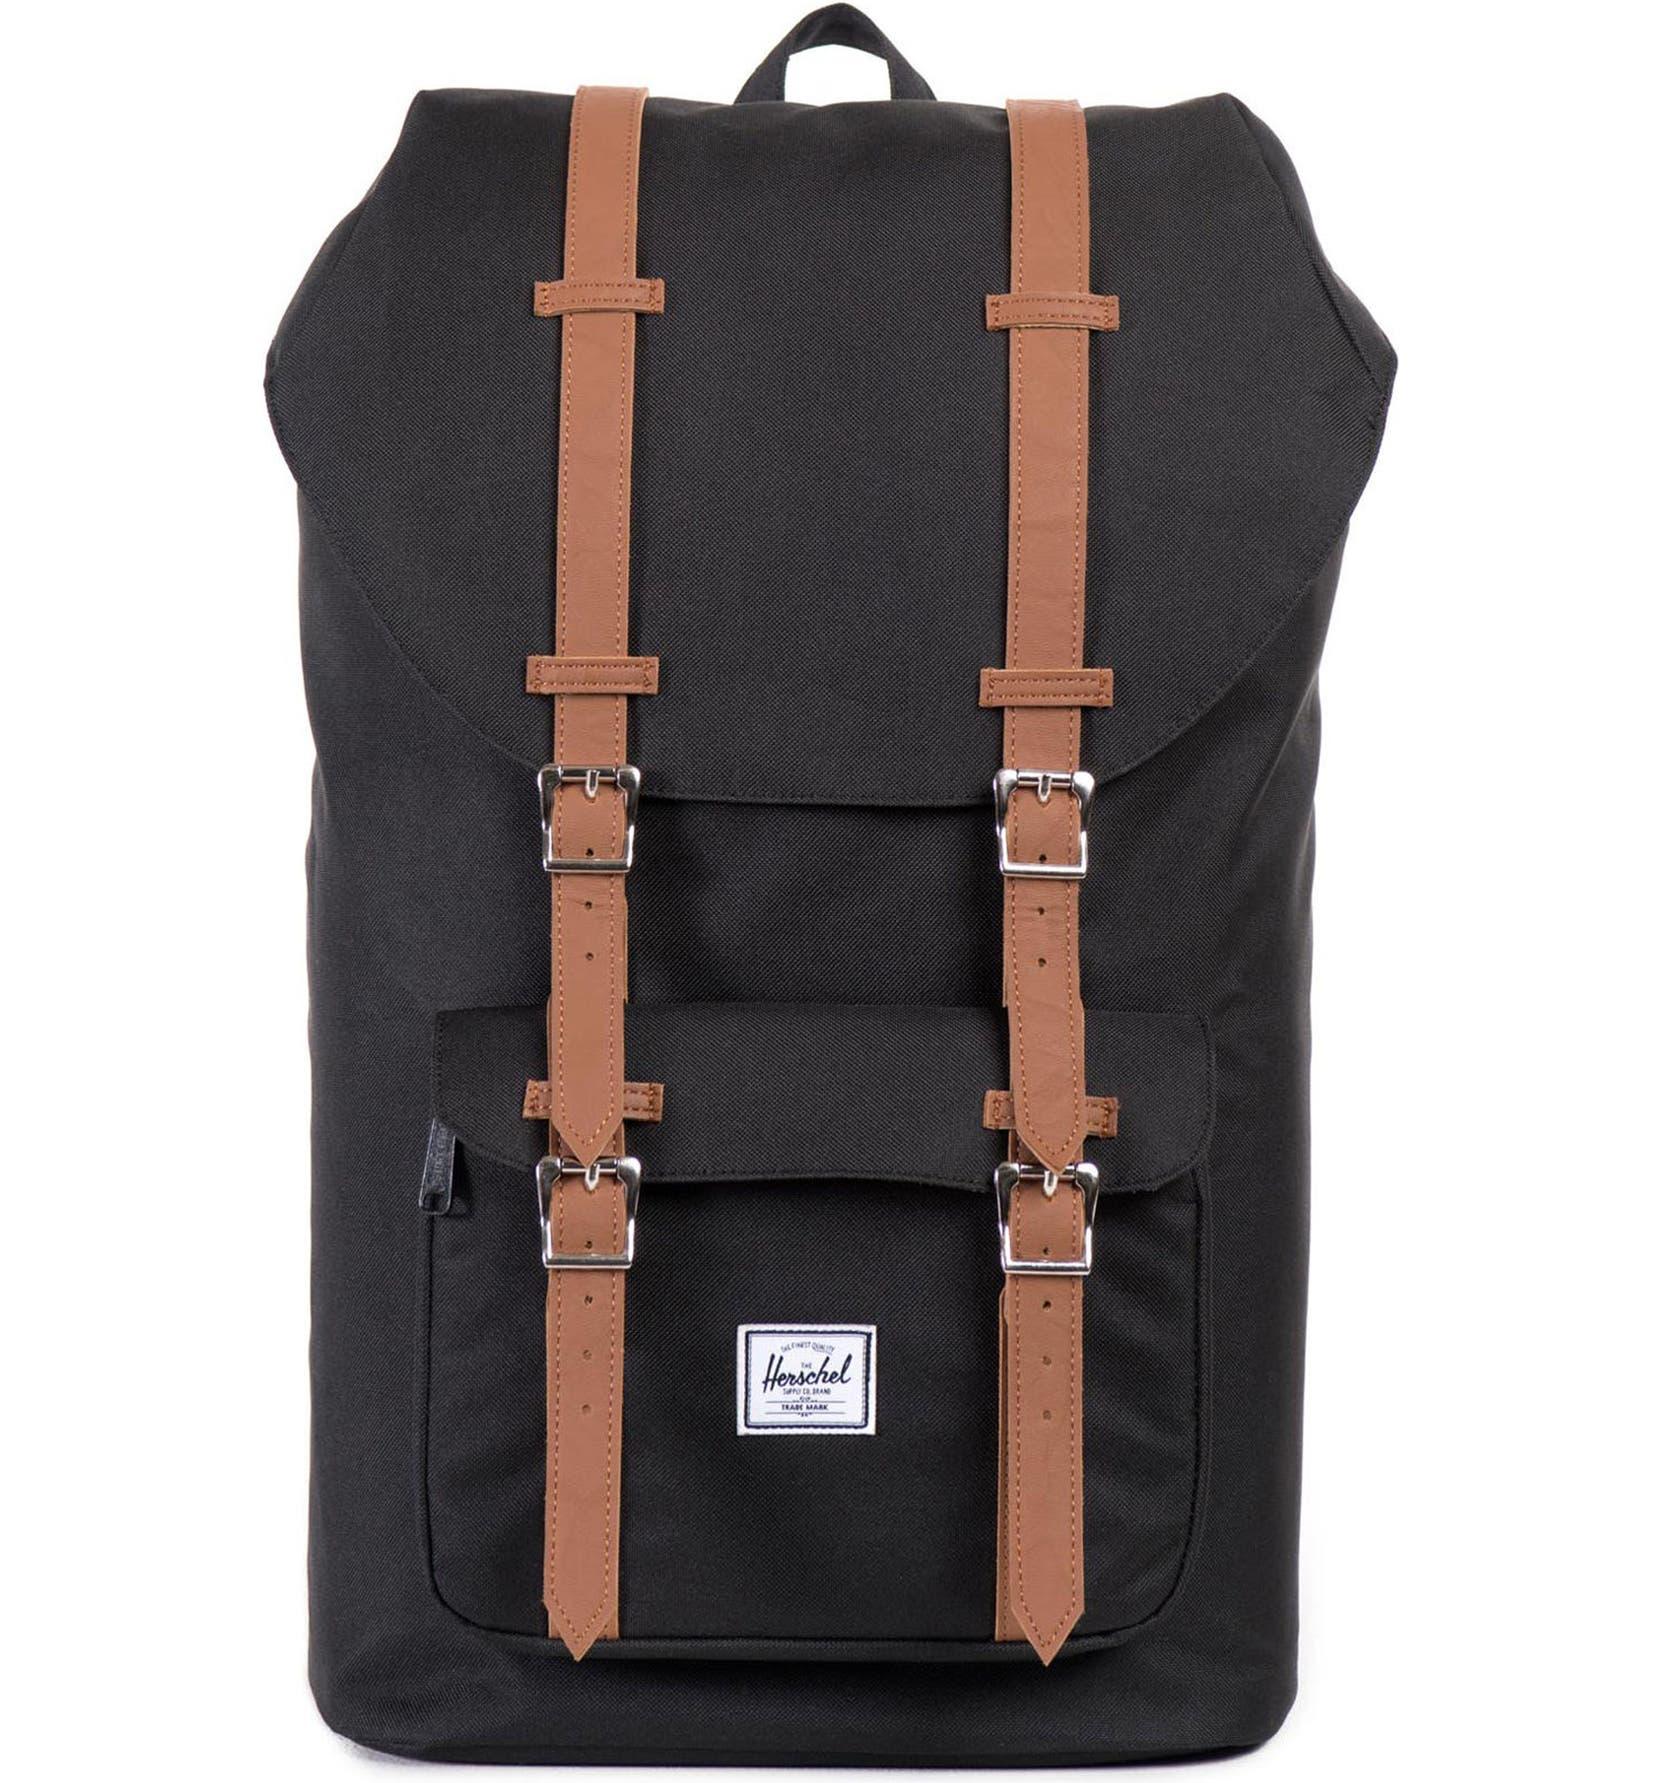 dae3ad76b47aae Herschel Supply Co. 'Little America' Backpack | Nordstrom